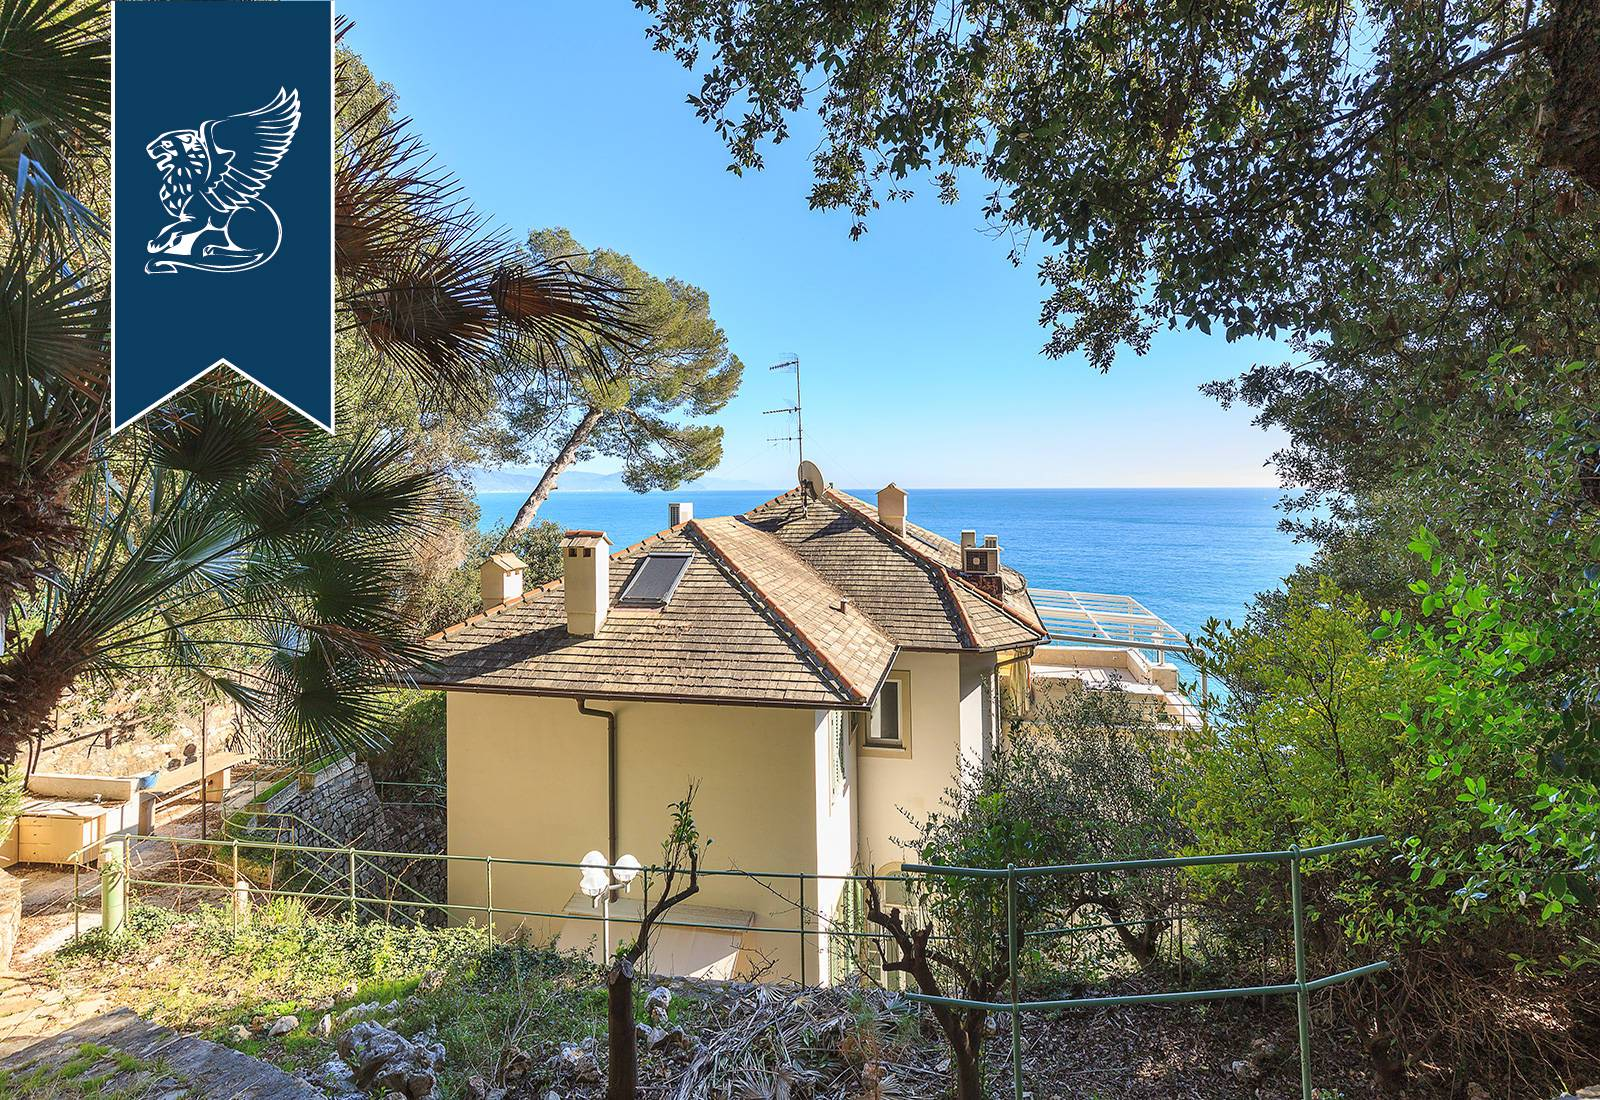 Villa in Vendita a Santa Margherita Ligure: 0 locali, 607 mq - Foto 9